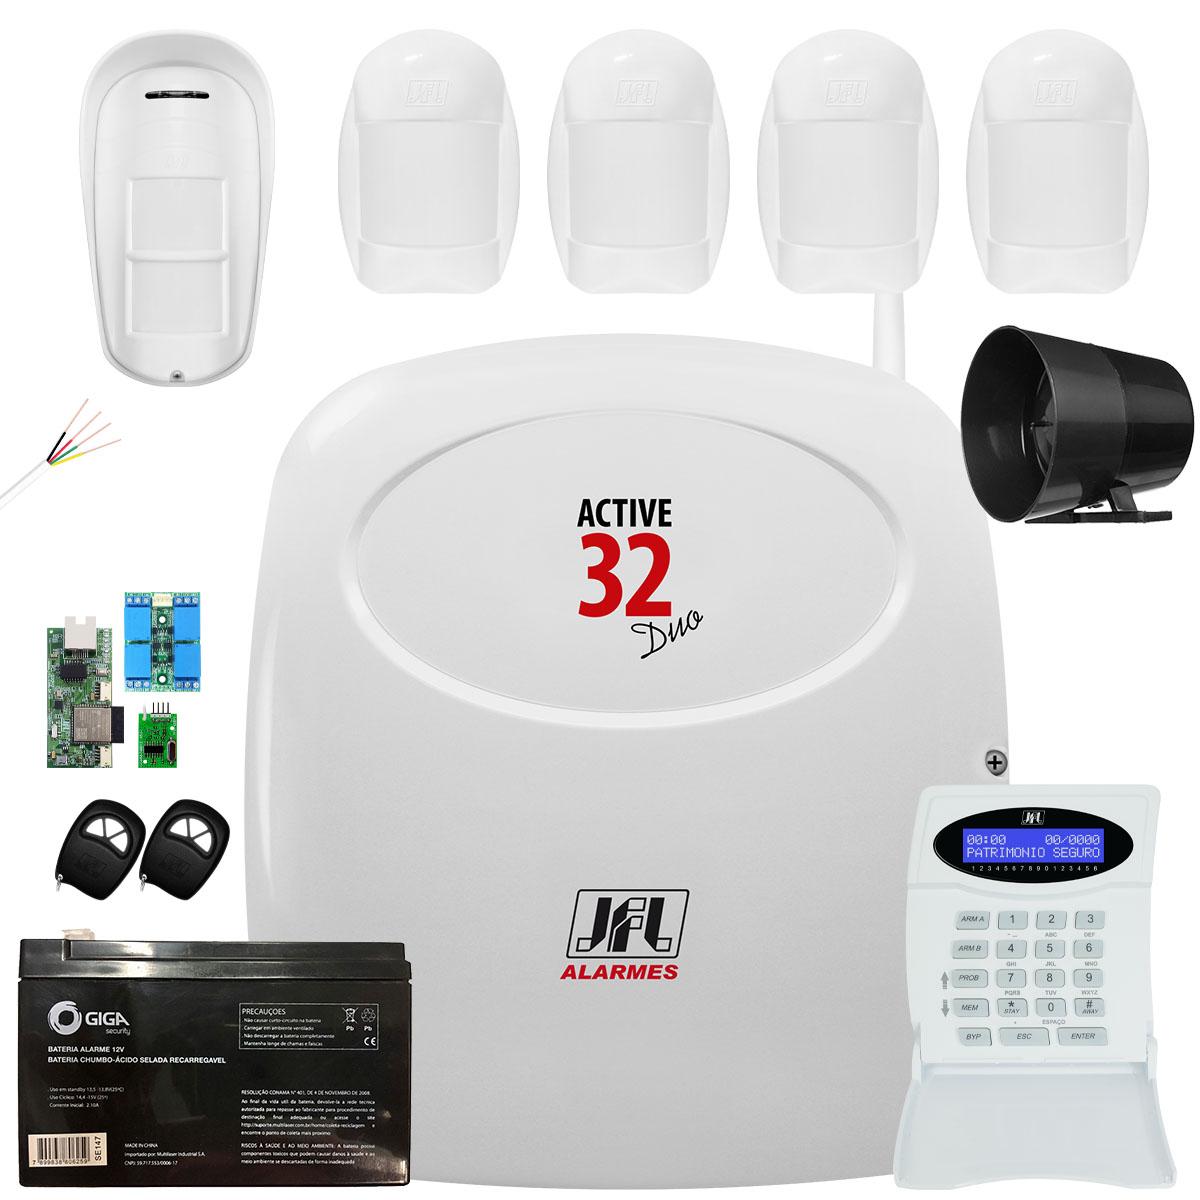 Kit Alarme Monitorado Active 32 Duo Com Ethernet E Gprs Completo